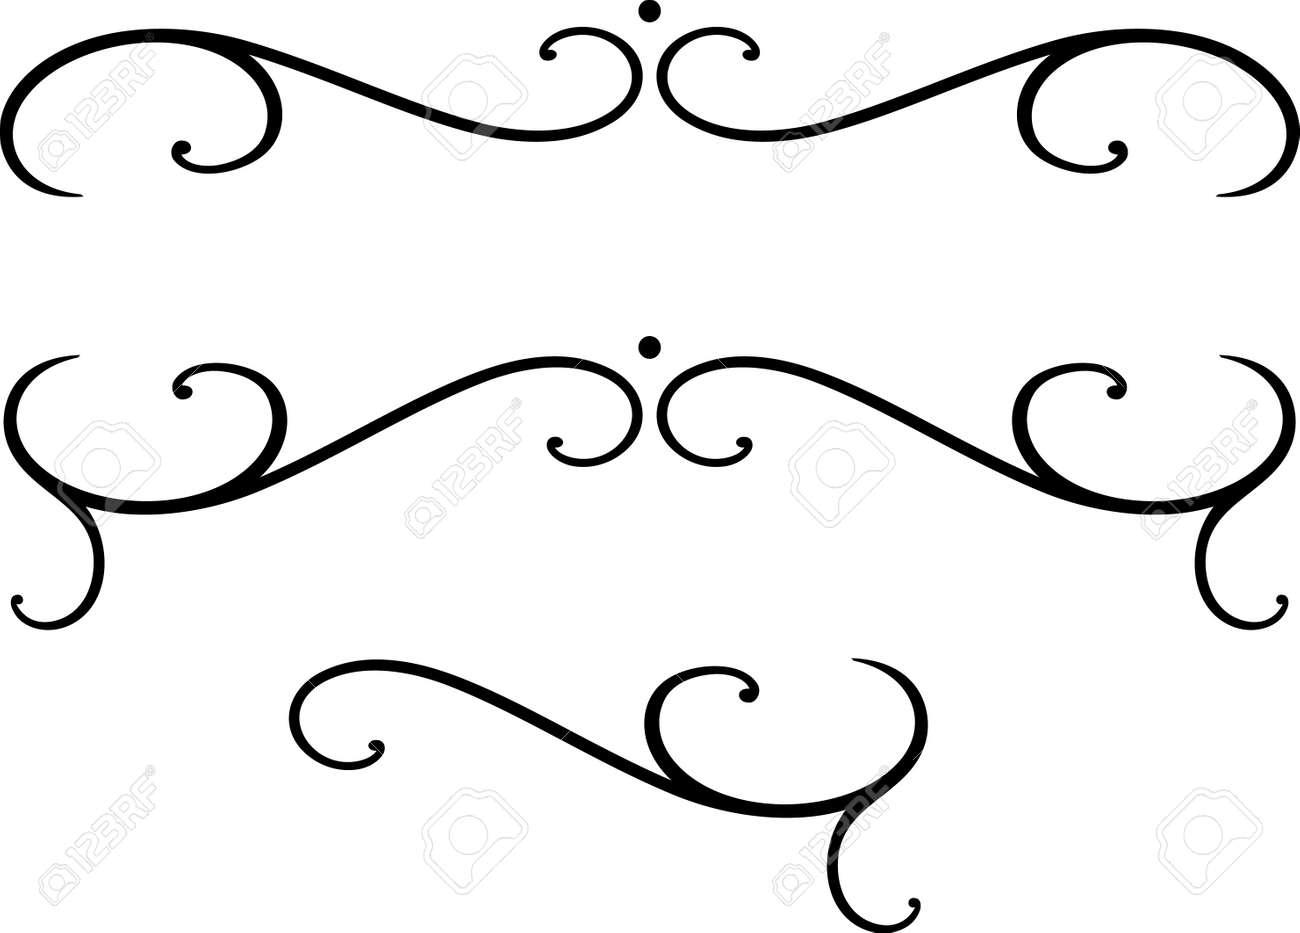 Set Of Original Vector Design Elements Royalty Free Cliparts